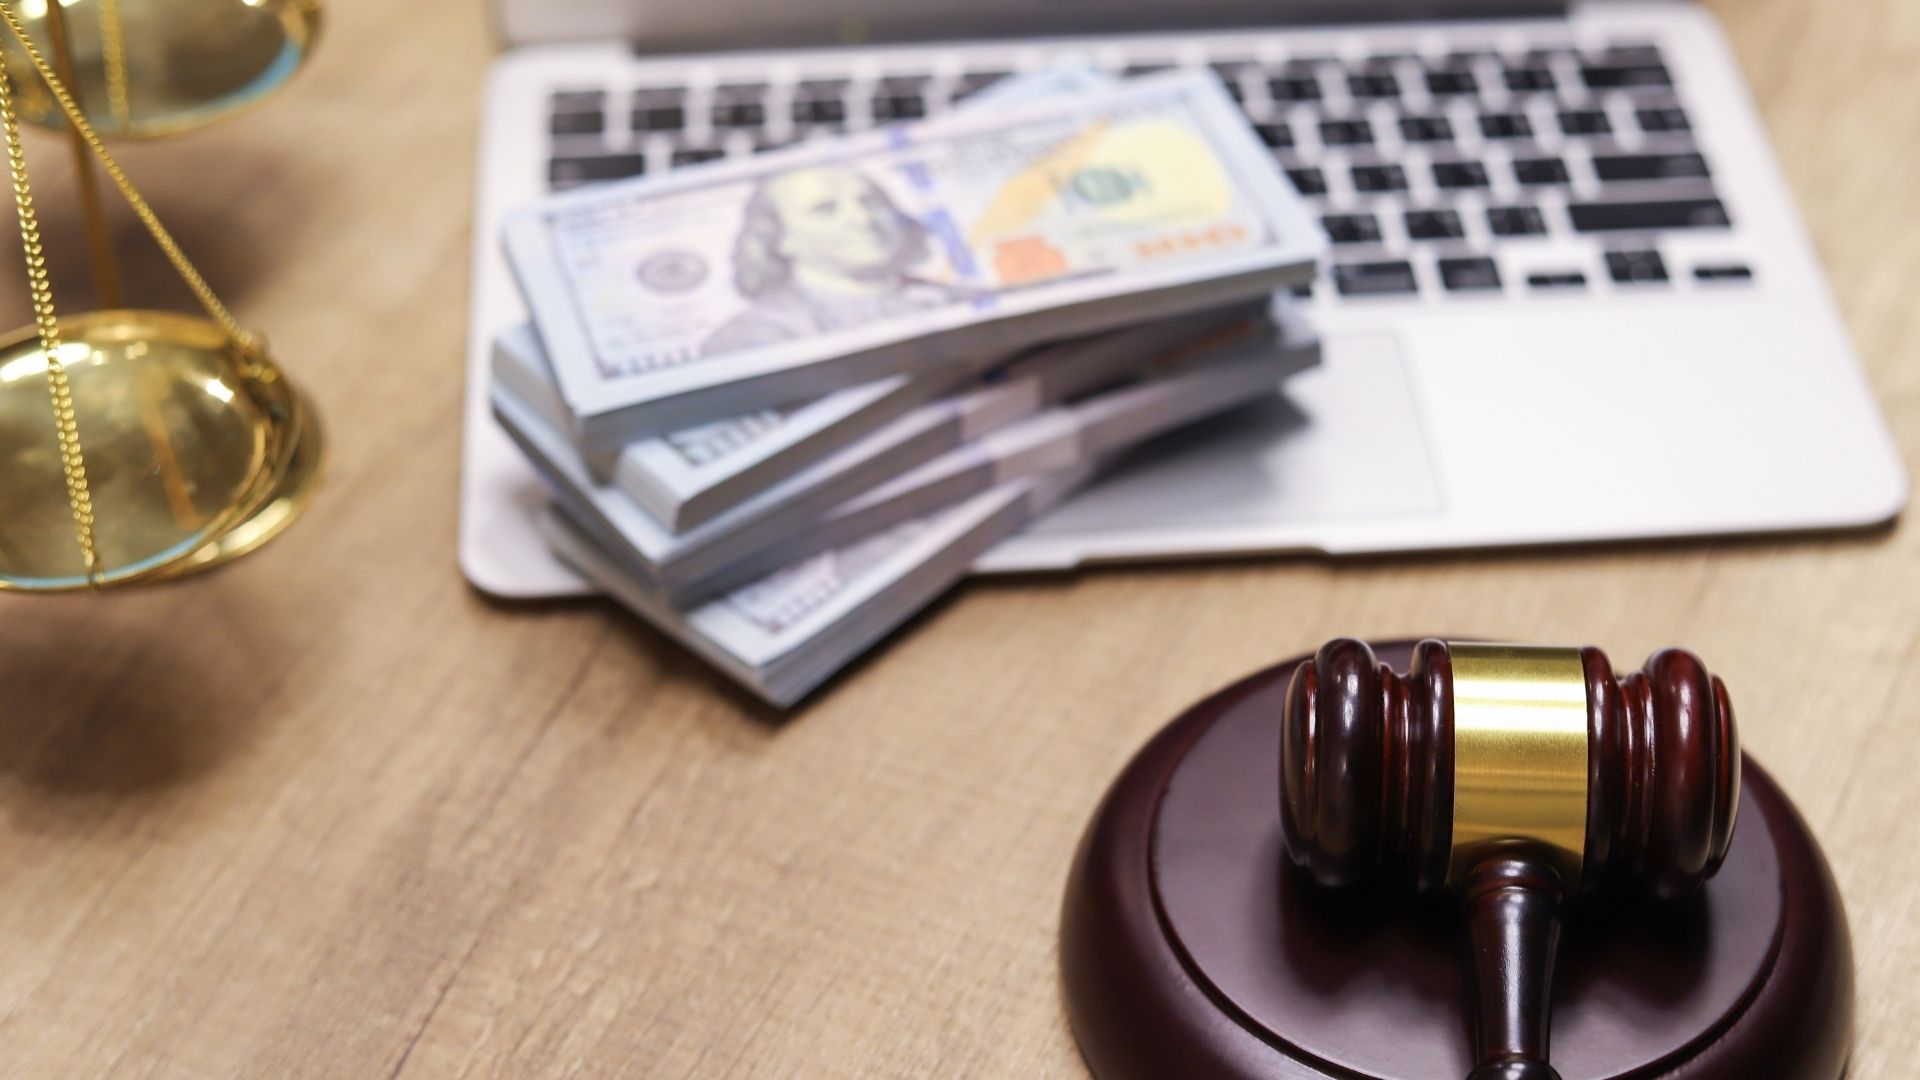 Read more about the article Δίκαιο της Οικονομίας και των Επιχειρήσεων (LLM, 2 Έτη) – Κοινό Πρόγραμμα με το Ελληνικό Ανοικτό Πανεπιστήμιο – Εξ Αποστάσεως